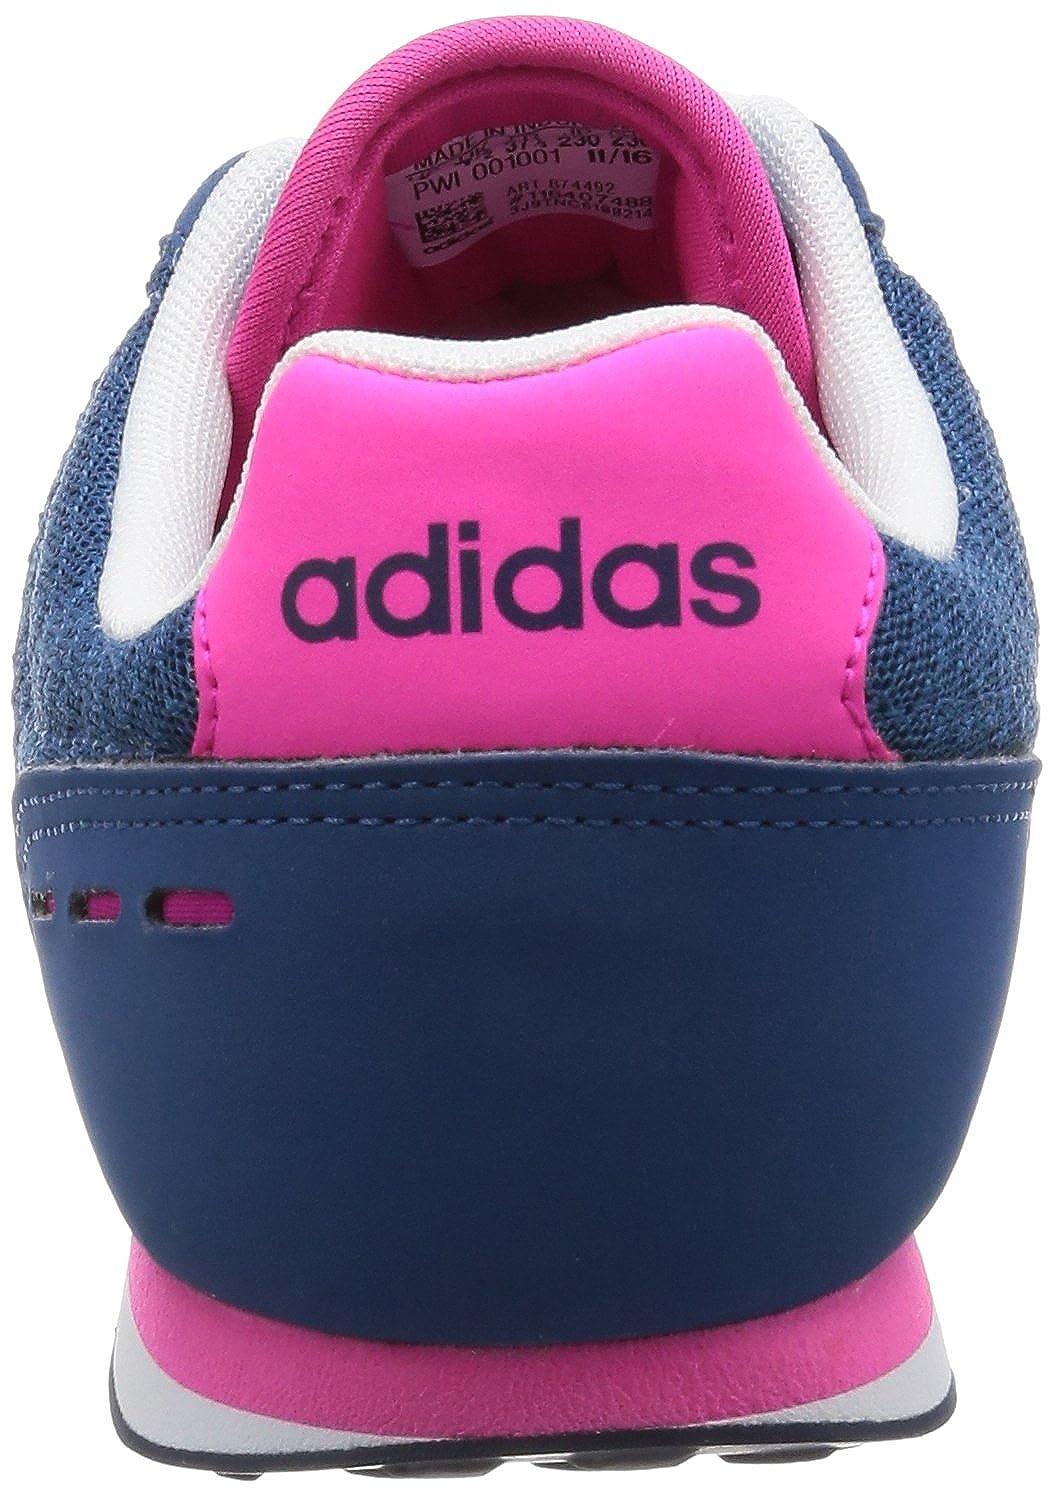 sports shoes 58dde db43c adidas Damen City Racer W Turnschuhe, Core Shock PinkMystery Blue  Amazon.de Schuhe  Handtaschen